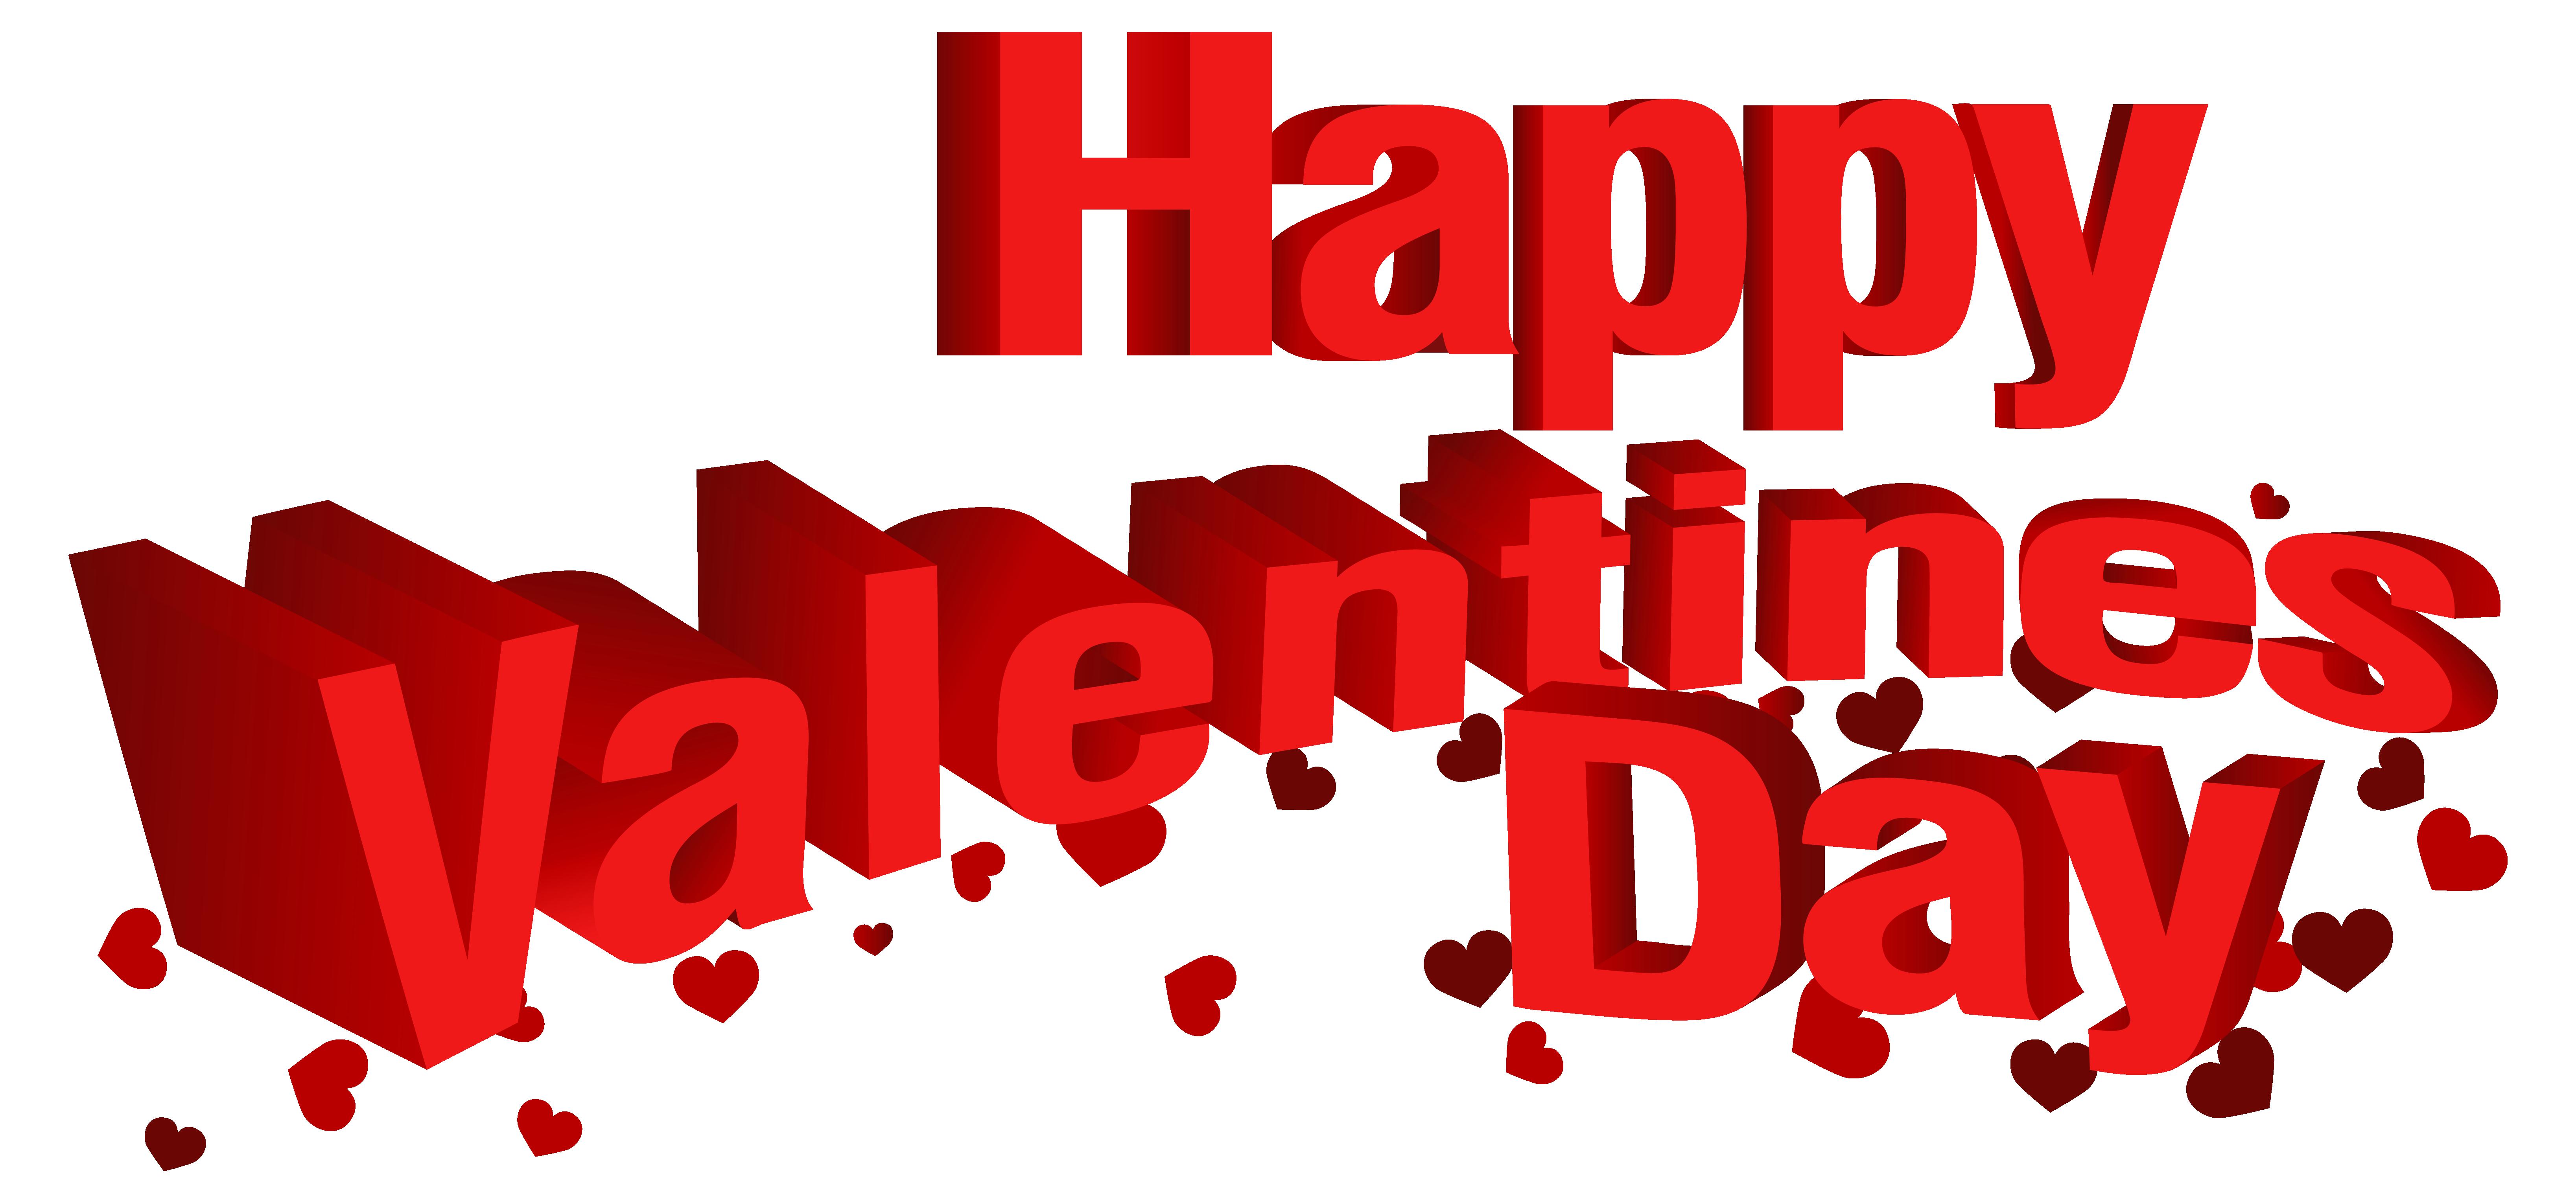 Happy valentines day extraordinary. Princess clipart valentine